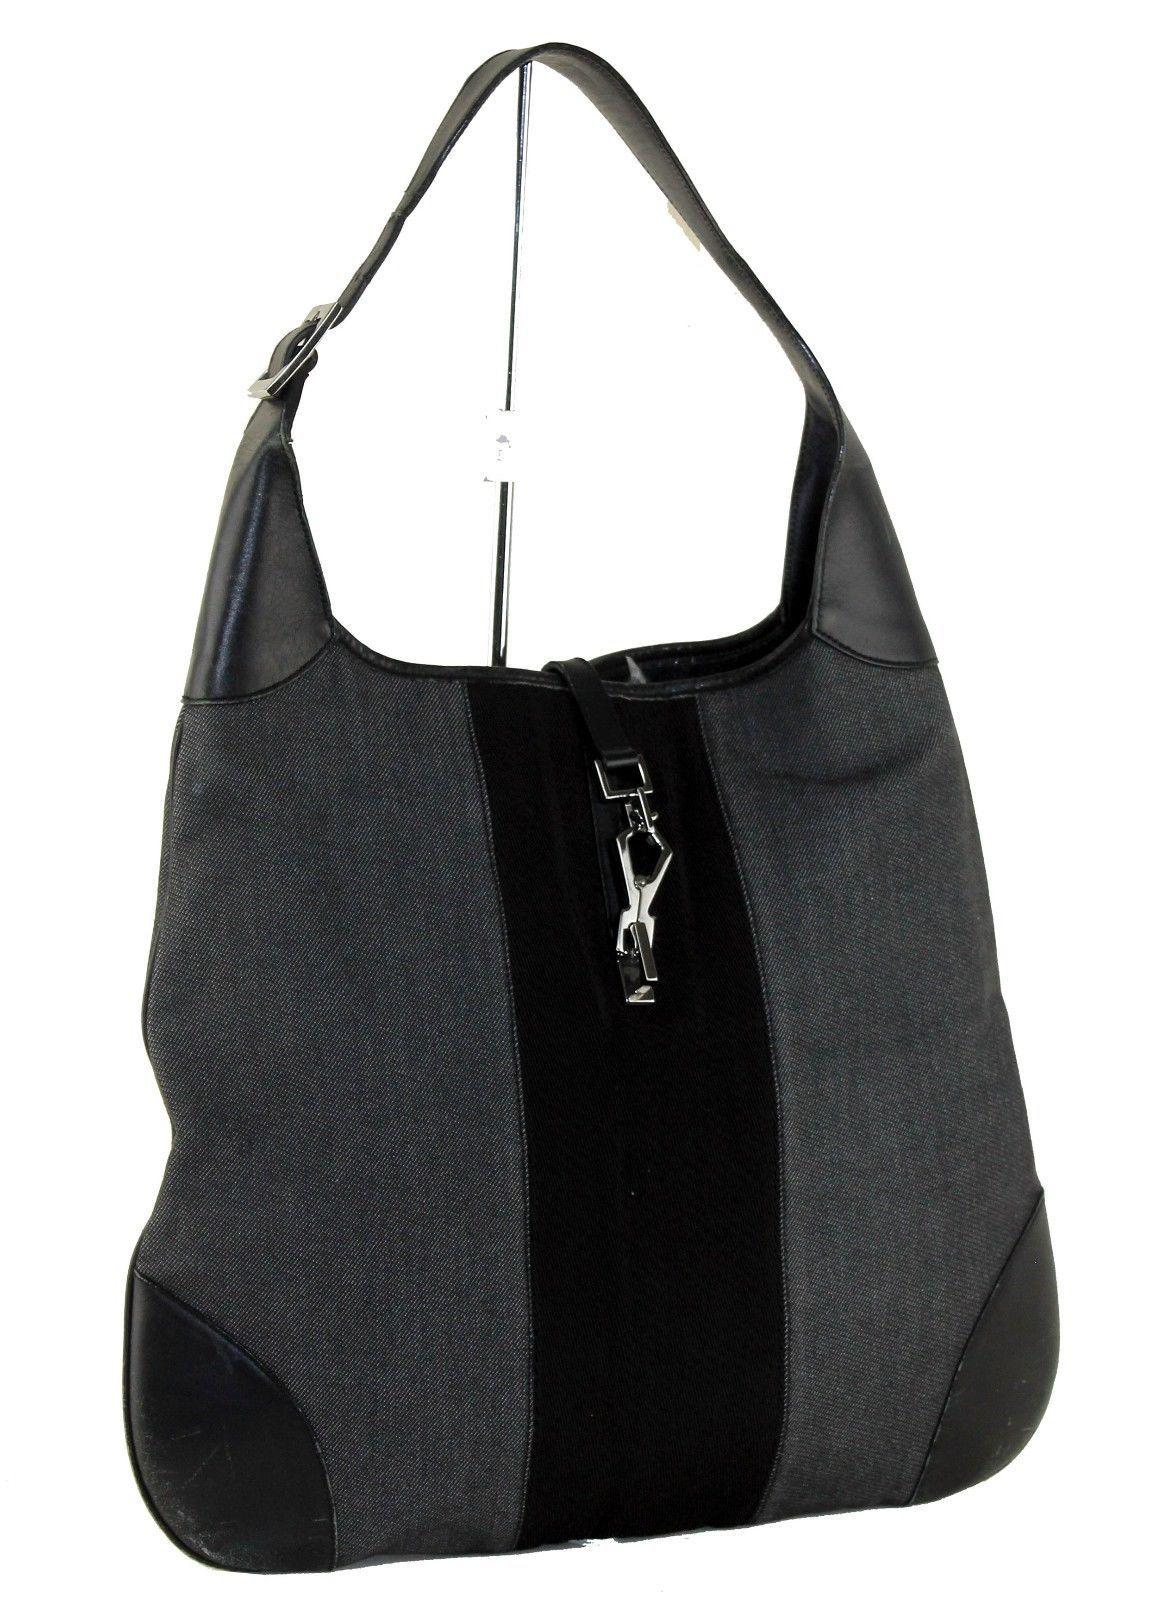 871e6d911ef2 S l1600. S l1600. Previous. Authentic GUCCI Gray Fabric Black Leather  Piston Lock Shoulder Bag Made Italy